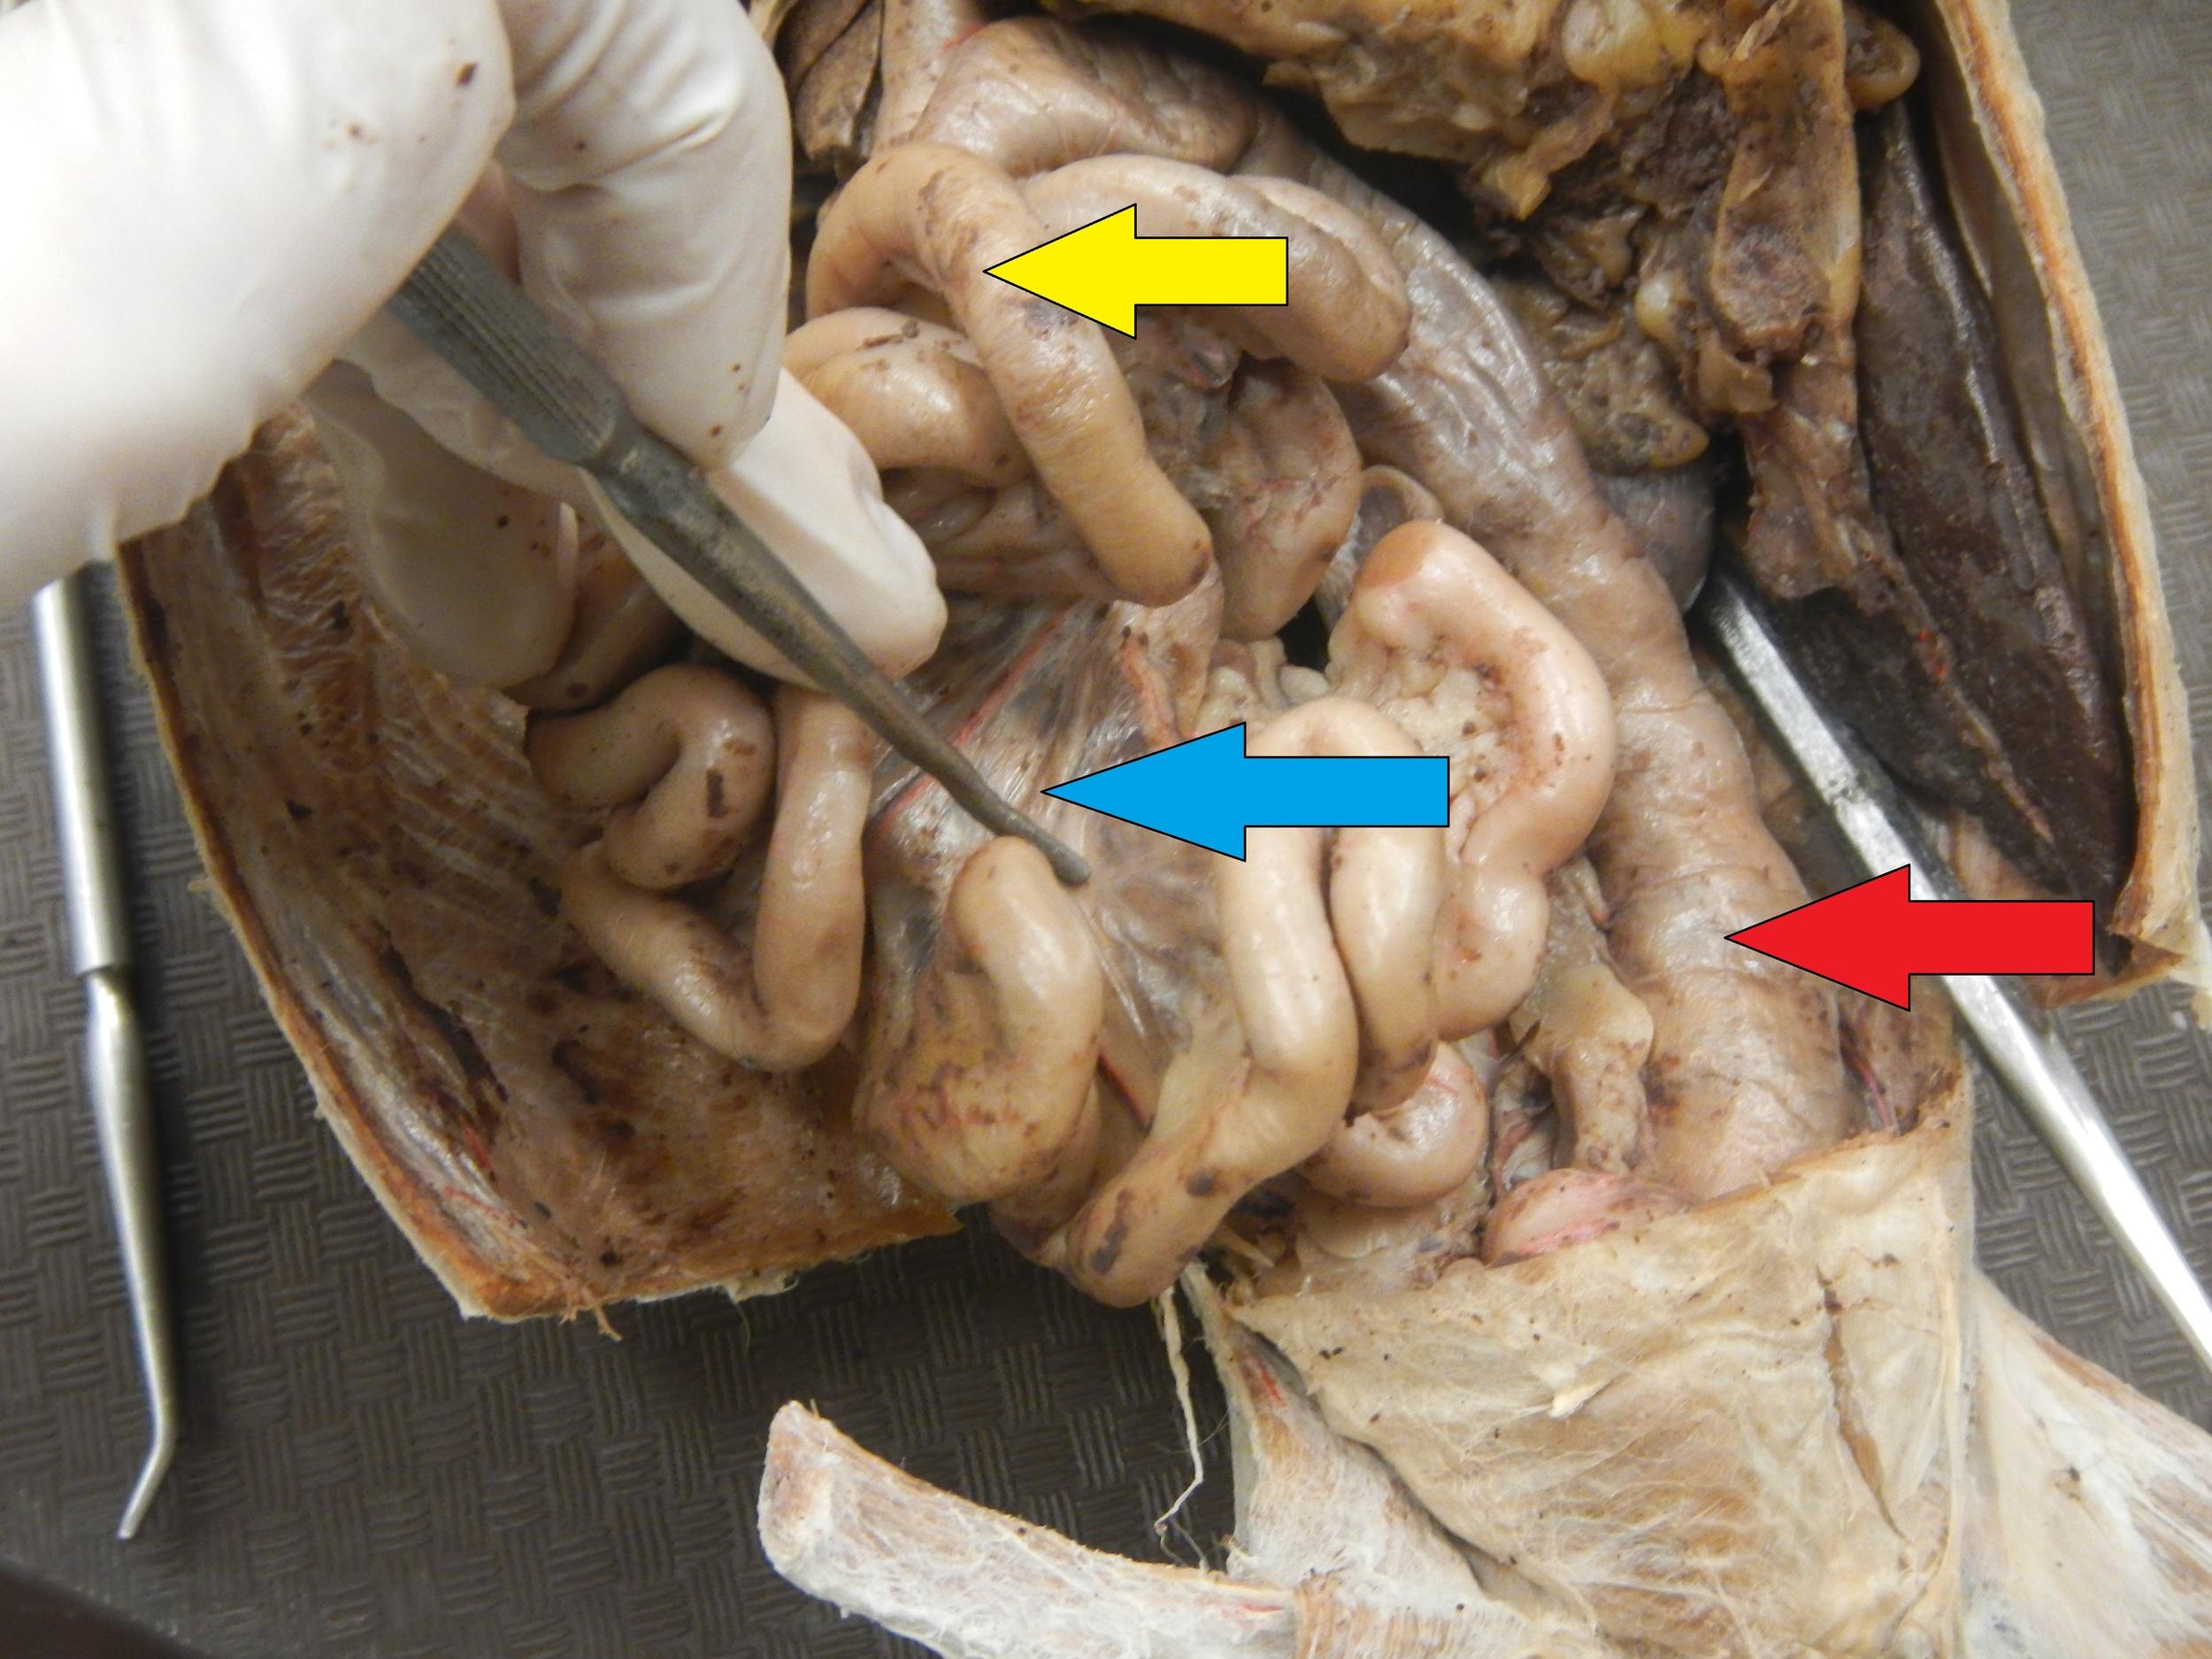 Yellow - Small Intestine  Blue - Mesentery (Small Intestine's)  Red - Large Intestine